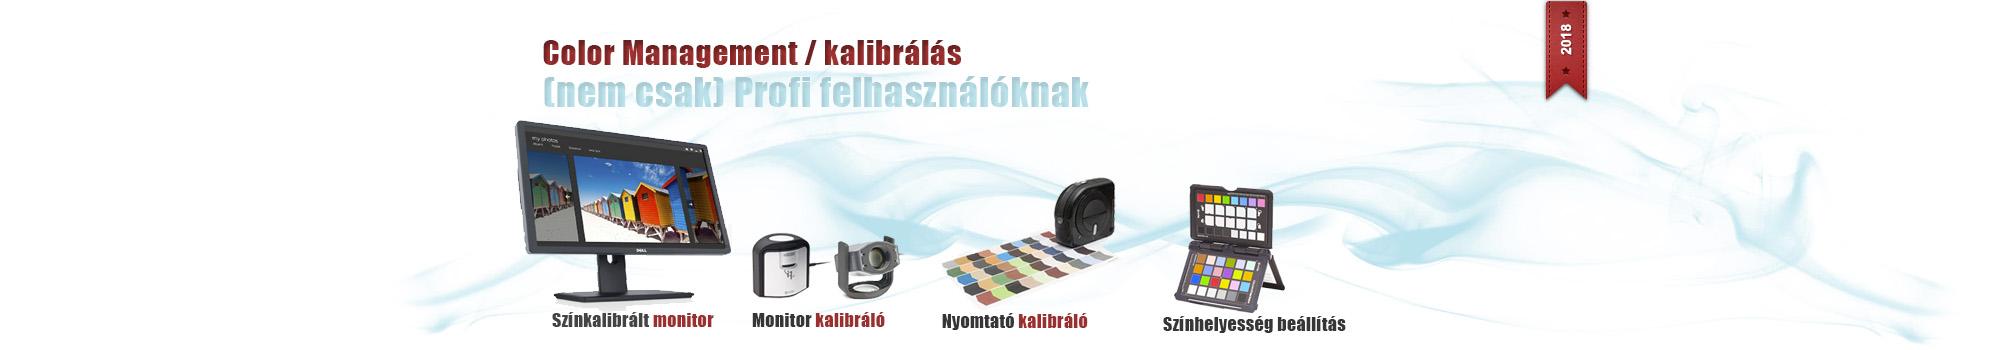 slider_berelheto_colormanagement-2